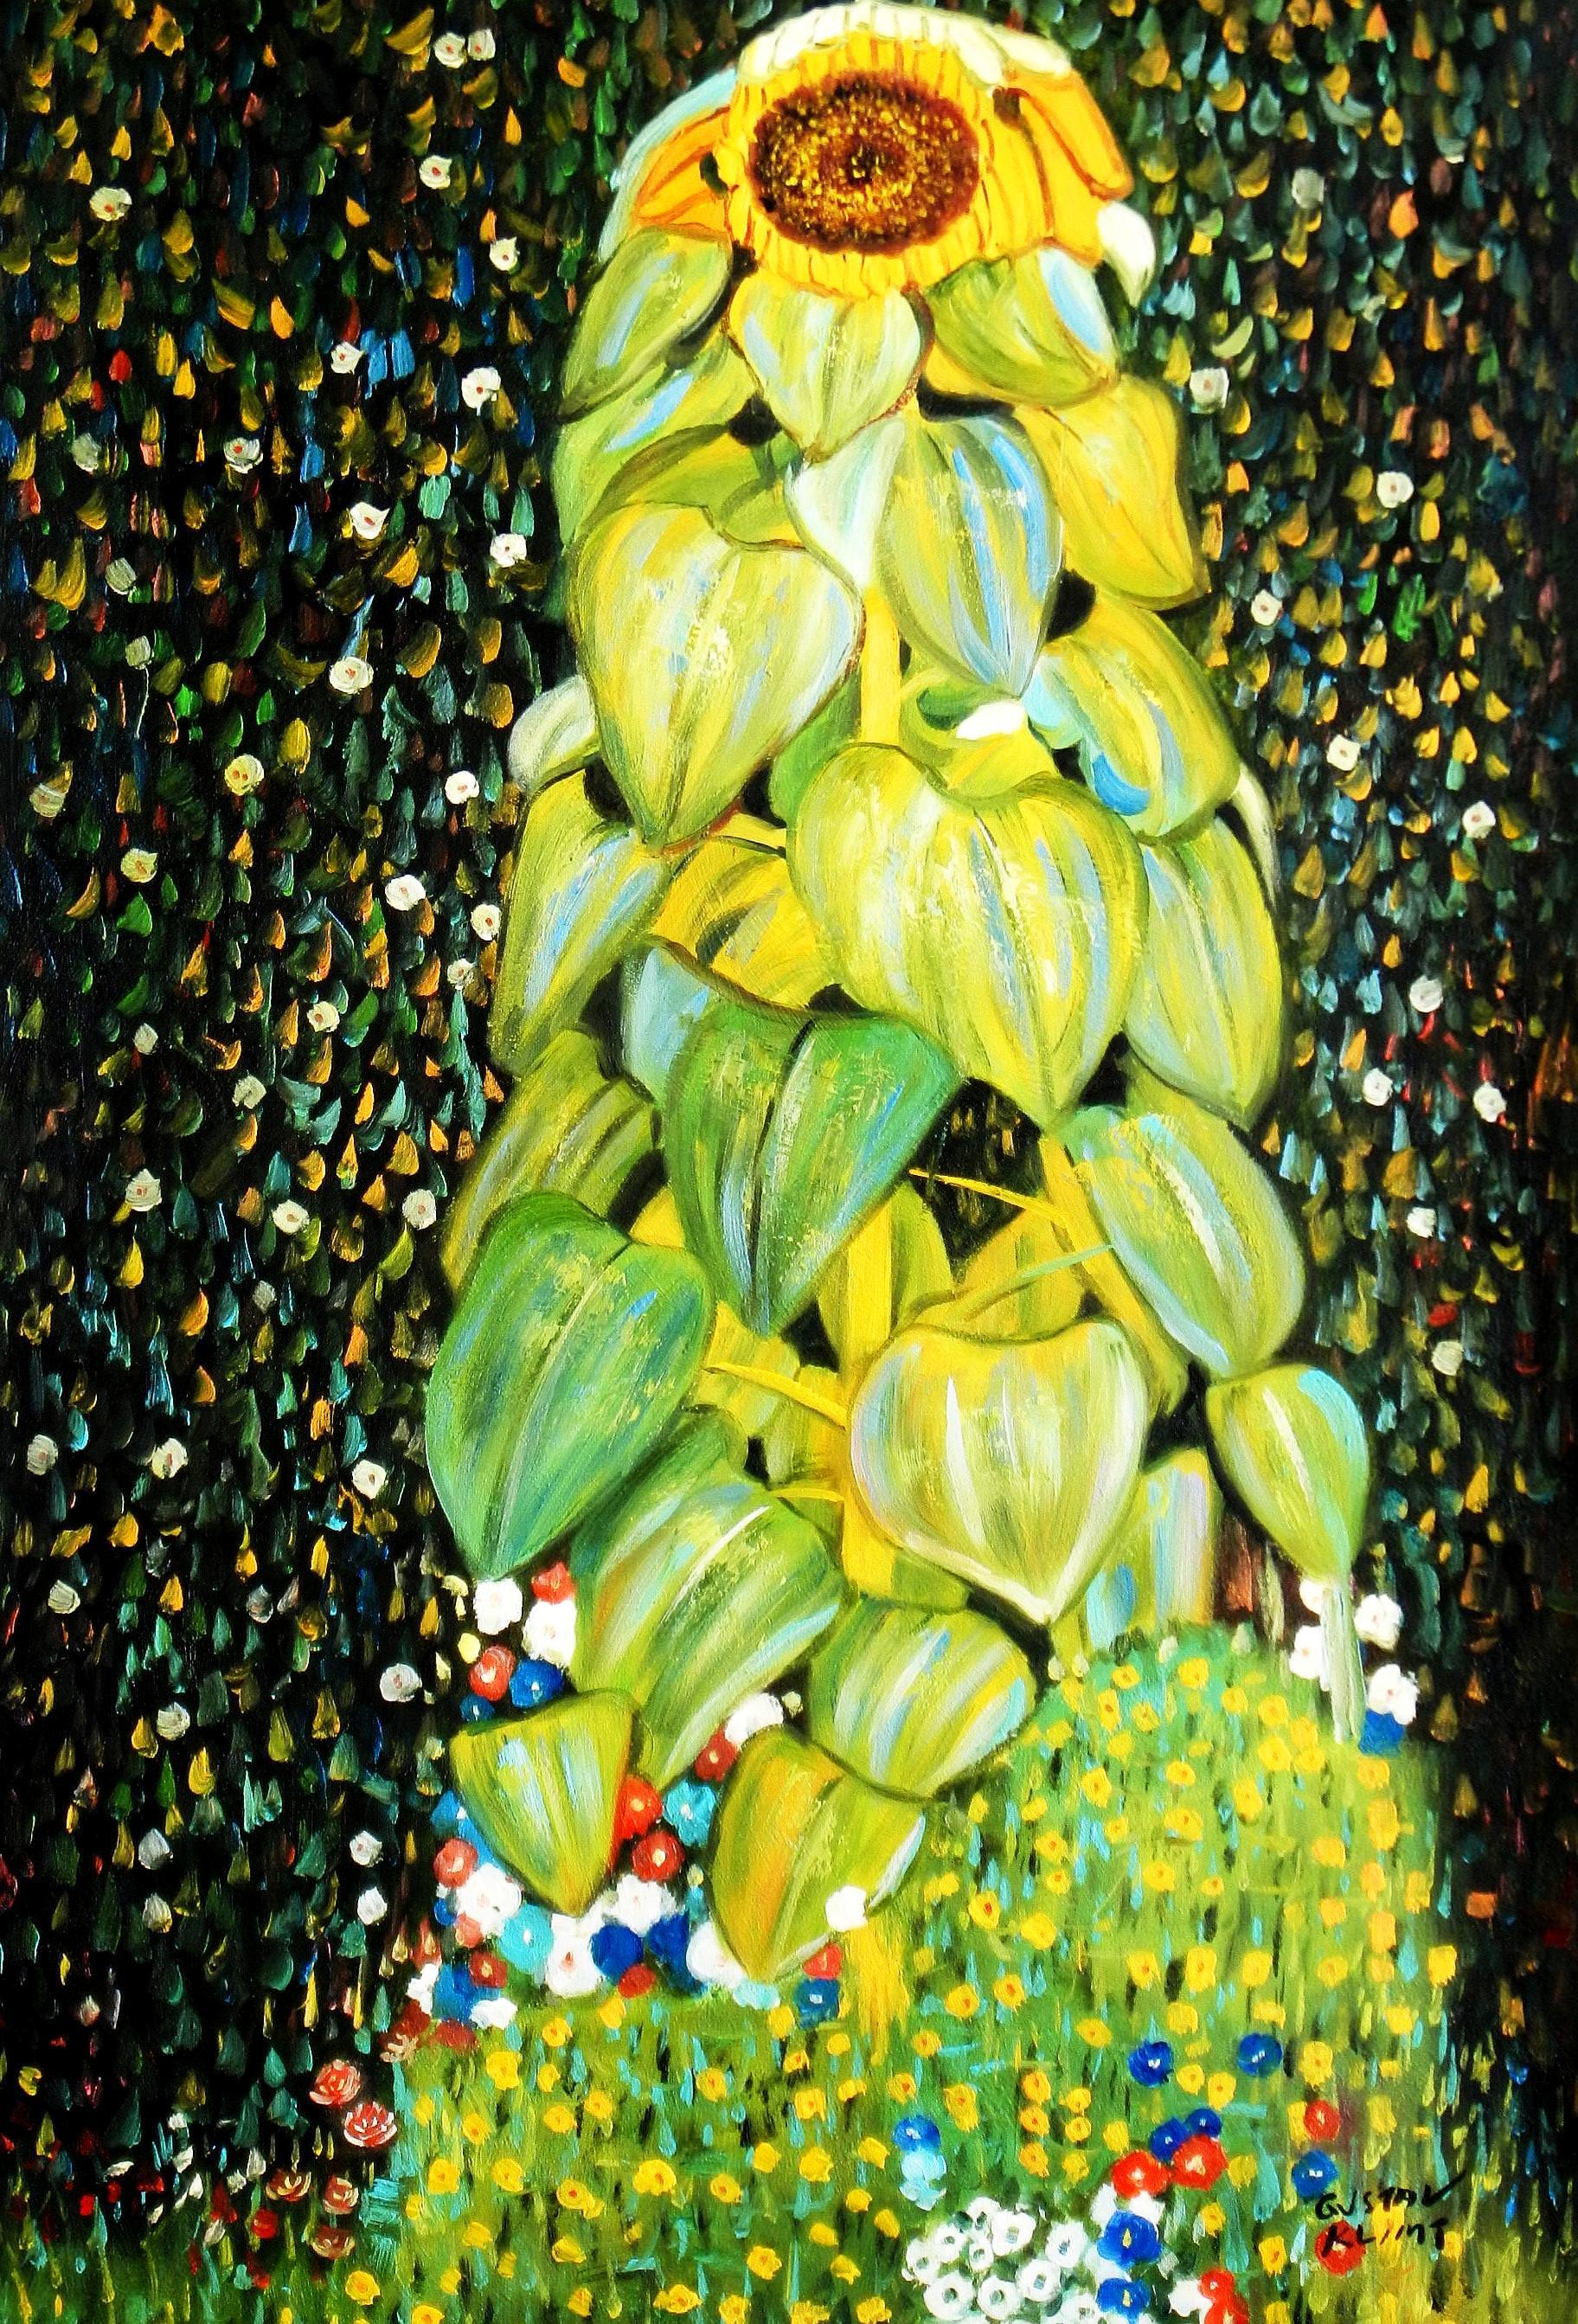 Gustav Klimt - Die Sonnenblume d93352 60x90cm handgemaltes Ölgemälde